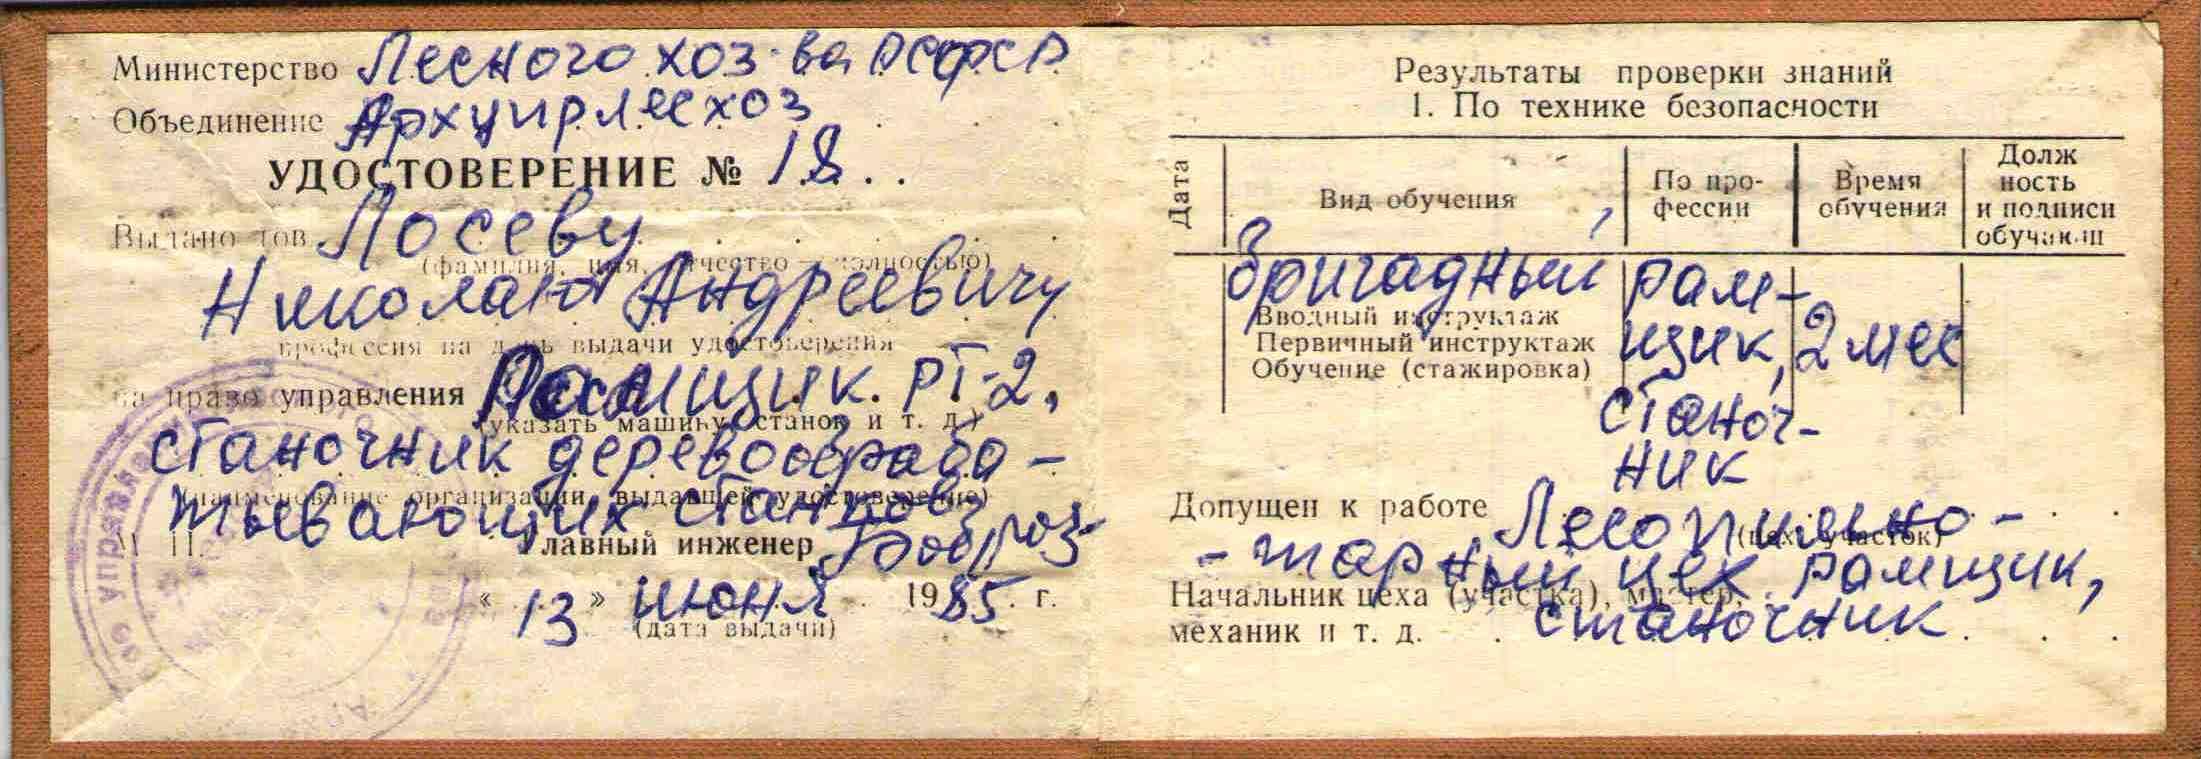 74. Удостоверение о проверке знаний по технике безопасности, 1985